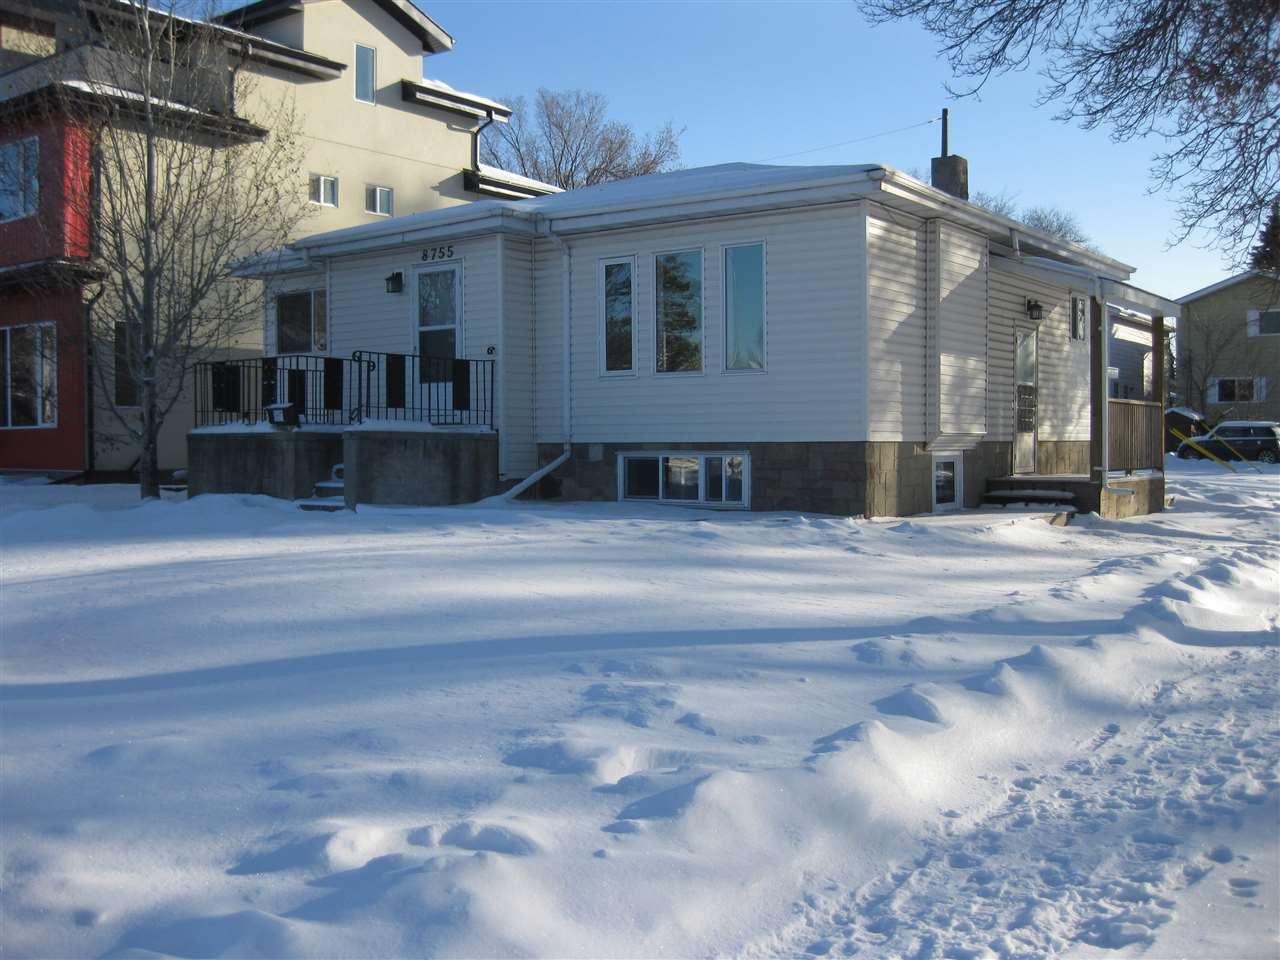 Main Photo: 8755 92A Avenue in Edmonton: Zone 18 House for sale : MLS®# E4221392